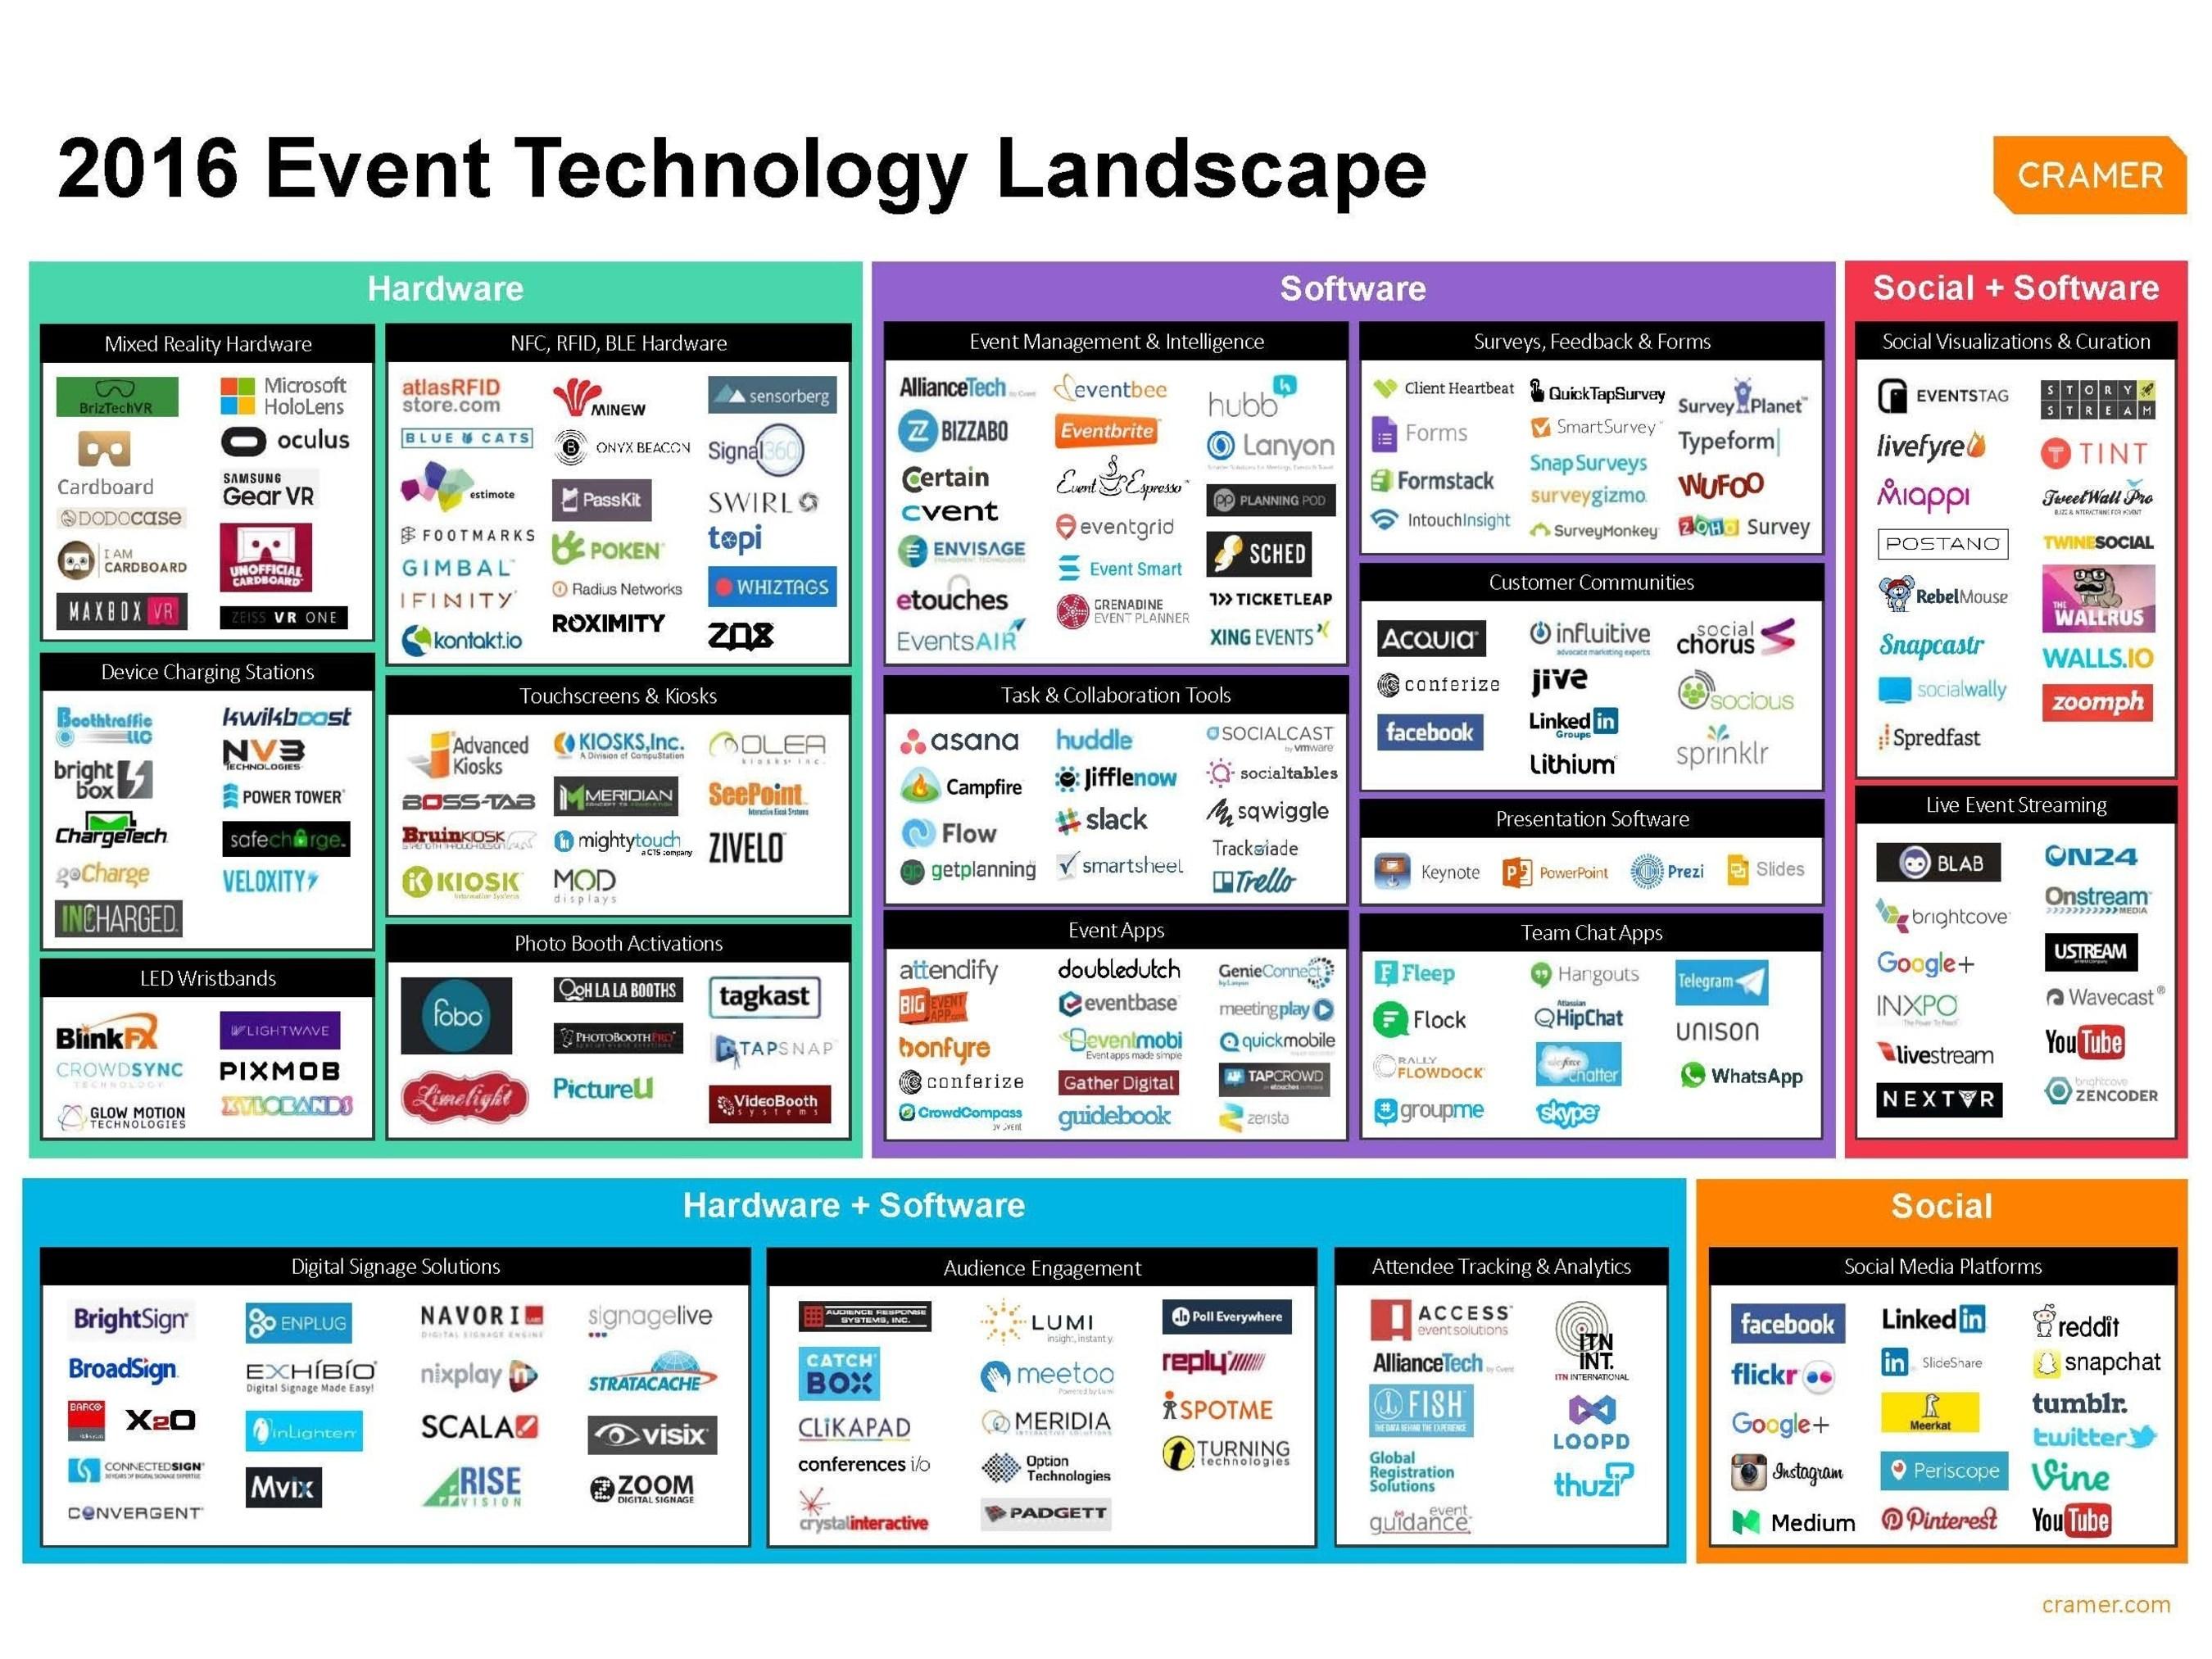 Cramer's 2016 Event Technology Landscape Supergraphic